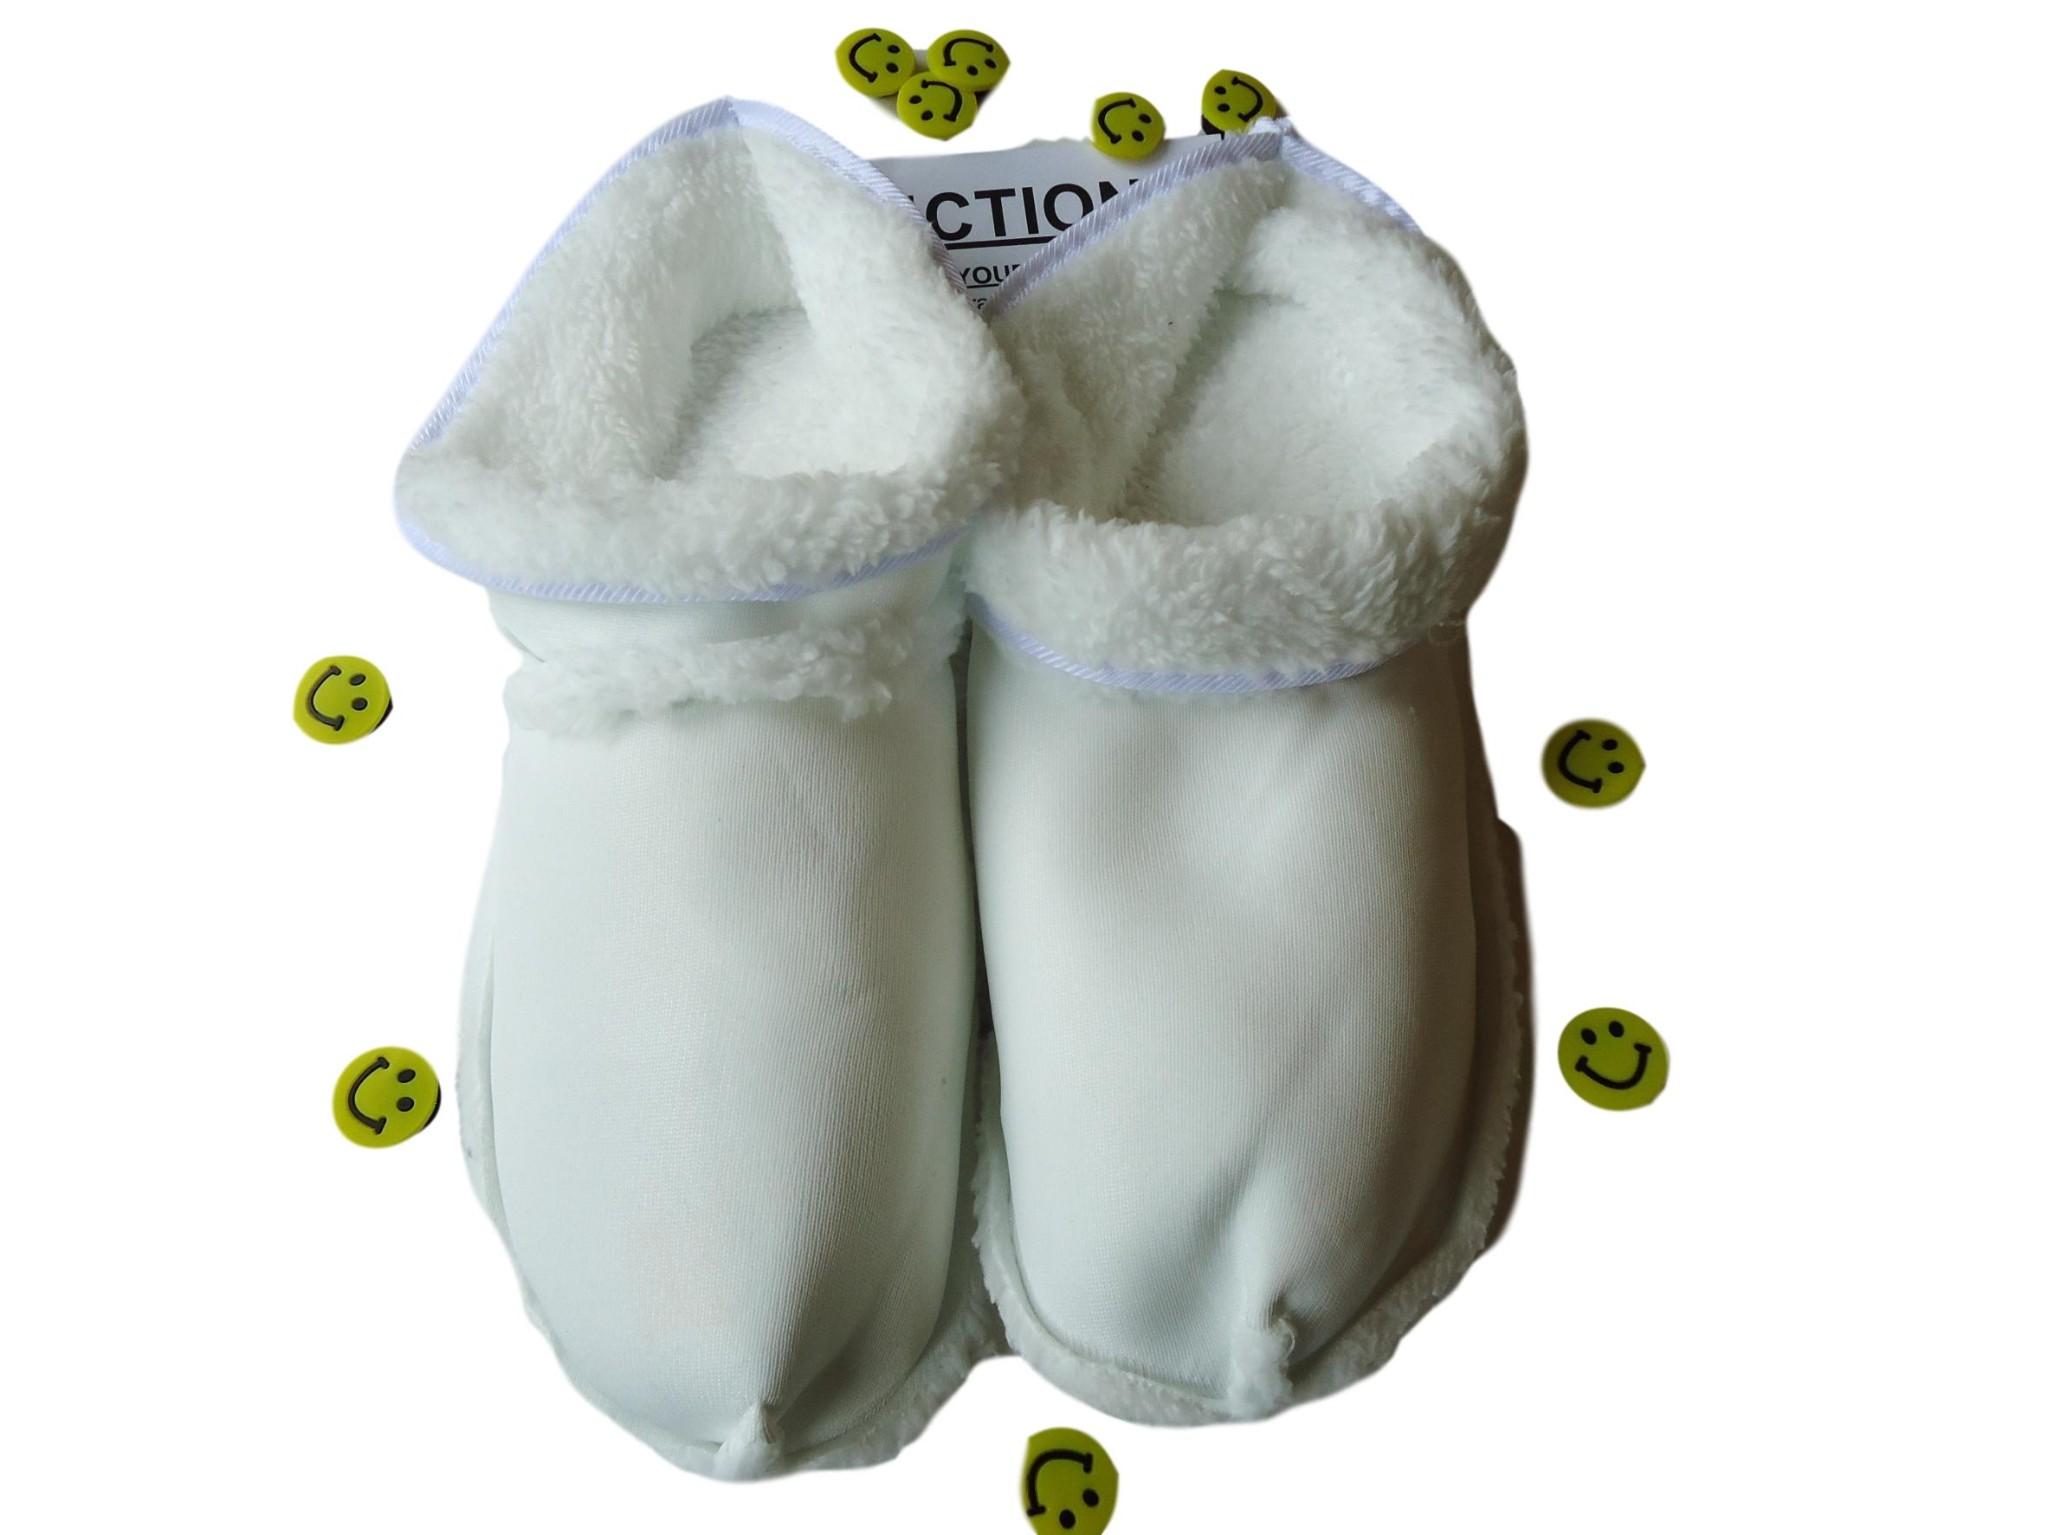 Crocs Slippers Shoes Clogs White Warm Fur